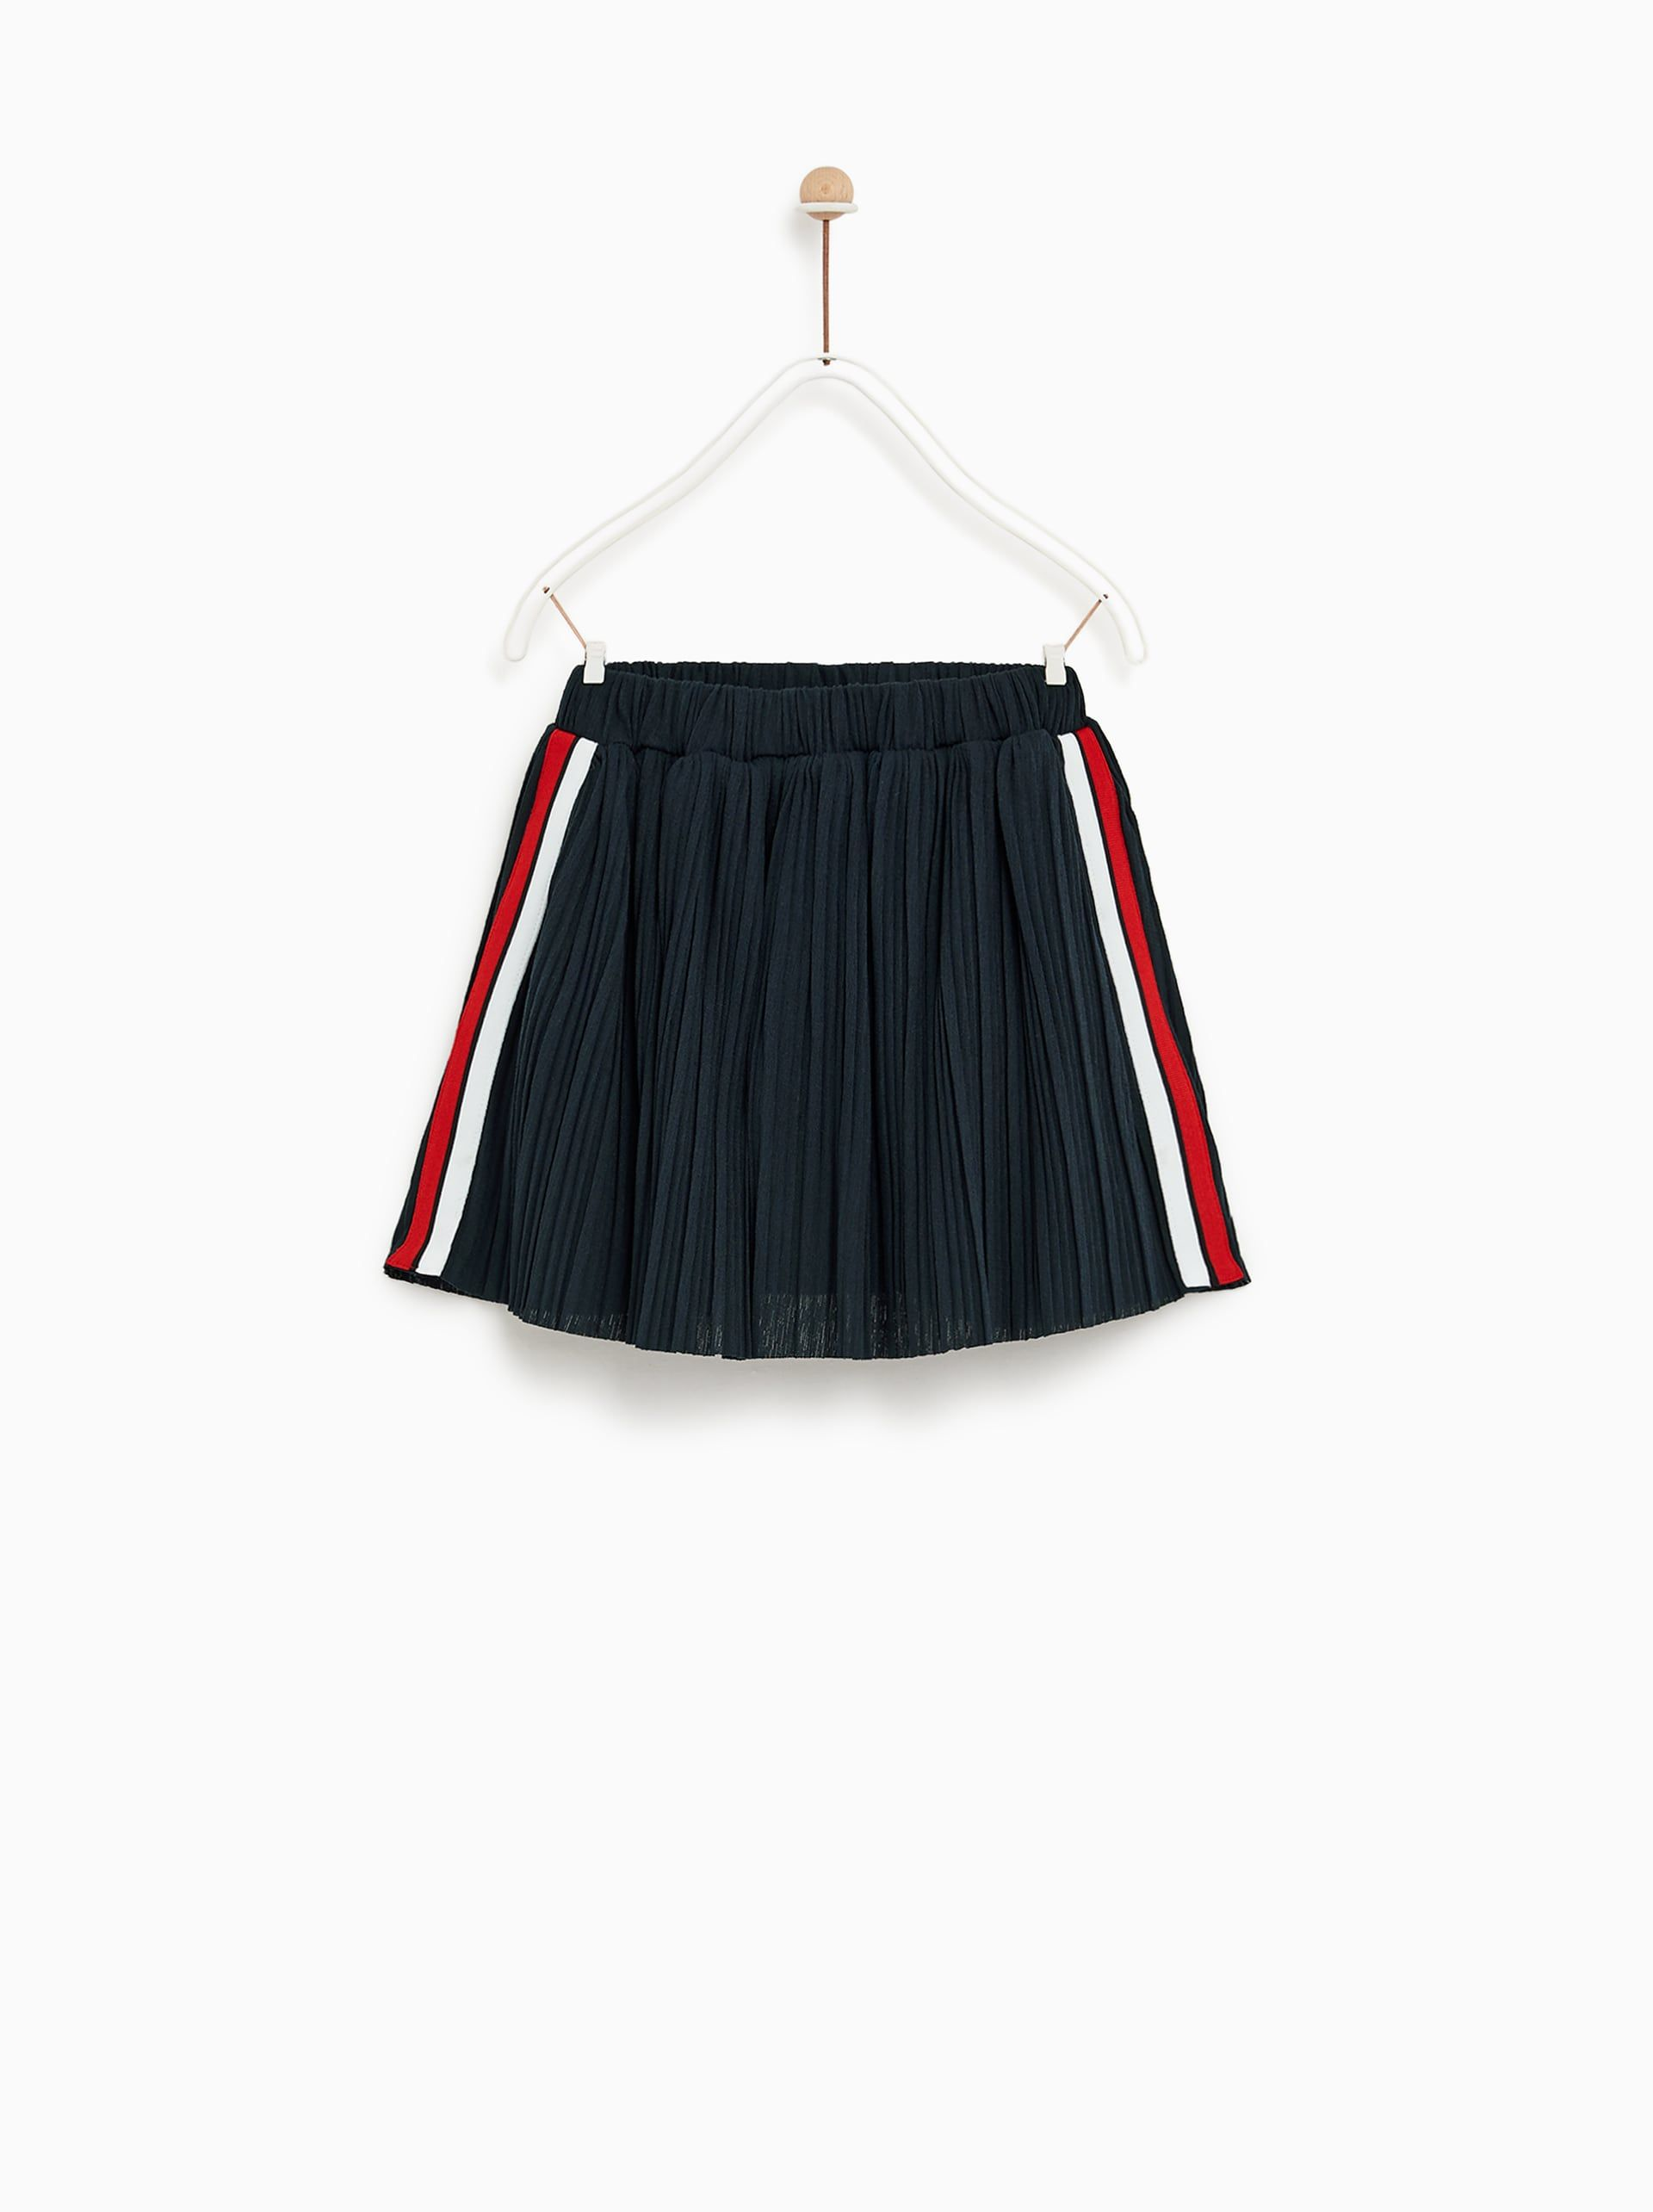 Image 1 Of Skirt With Side Stripes From Zara Saia Listrada Roupas De Menina Looks Estilosos